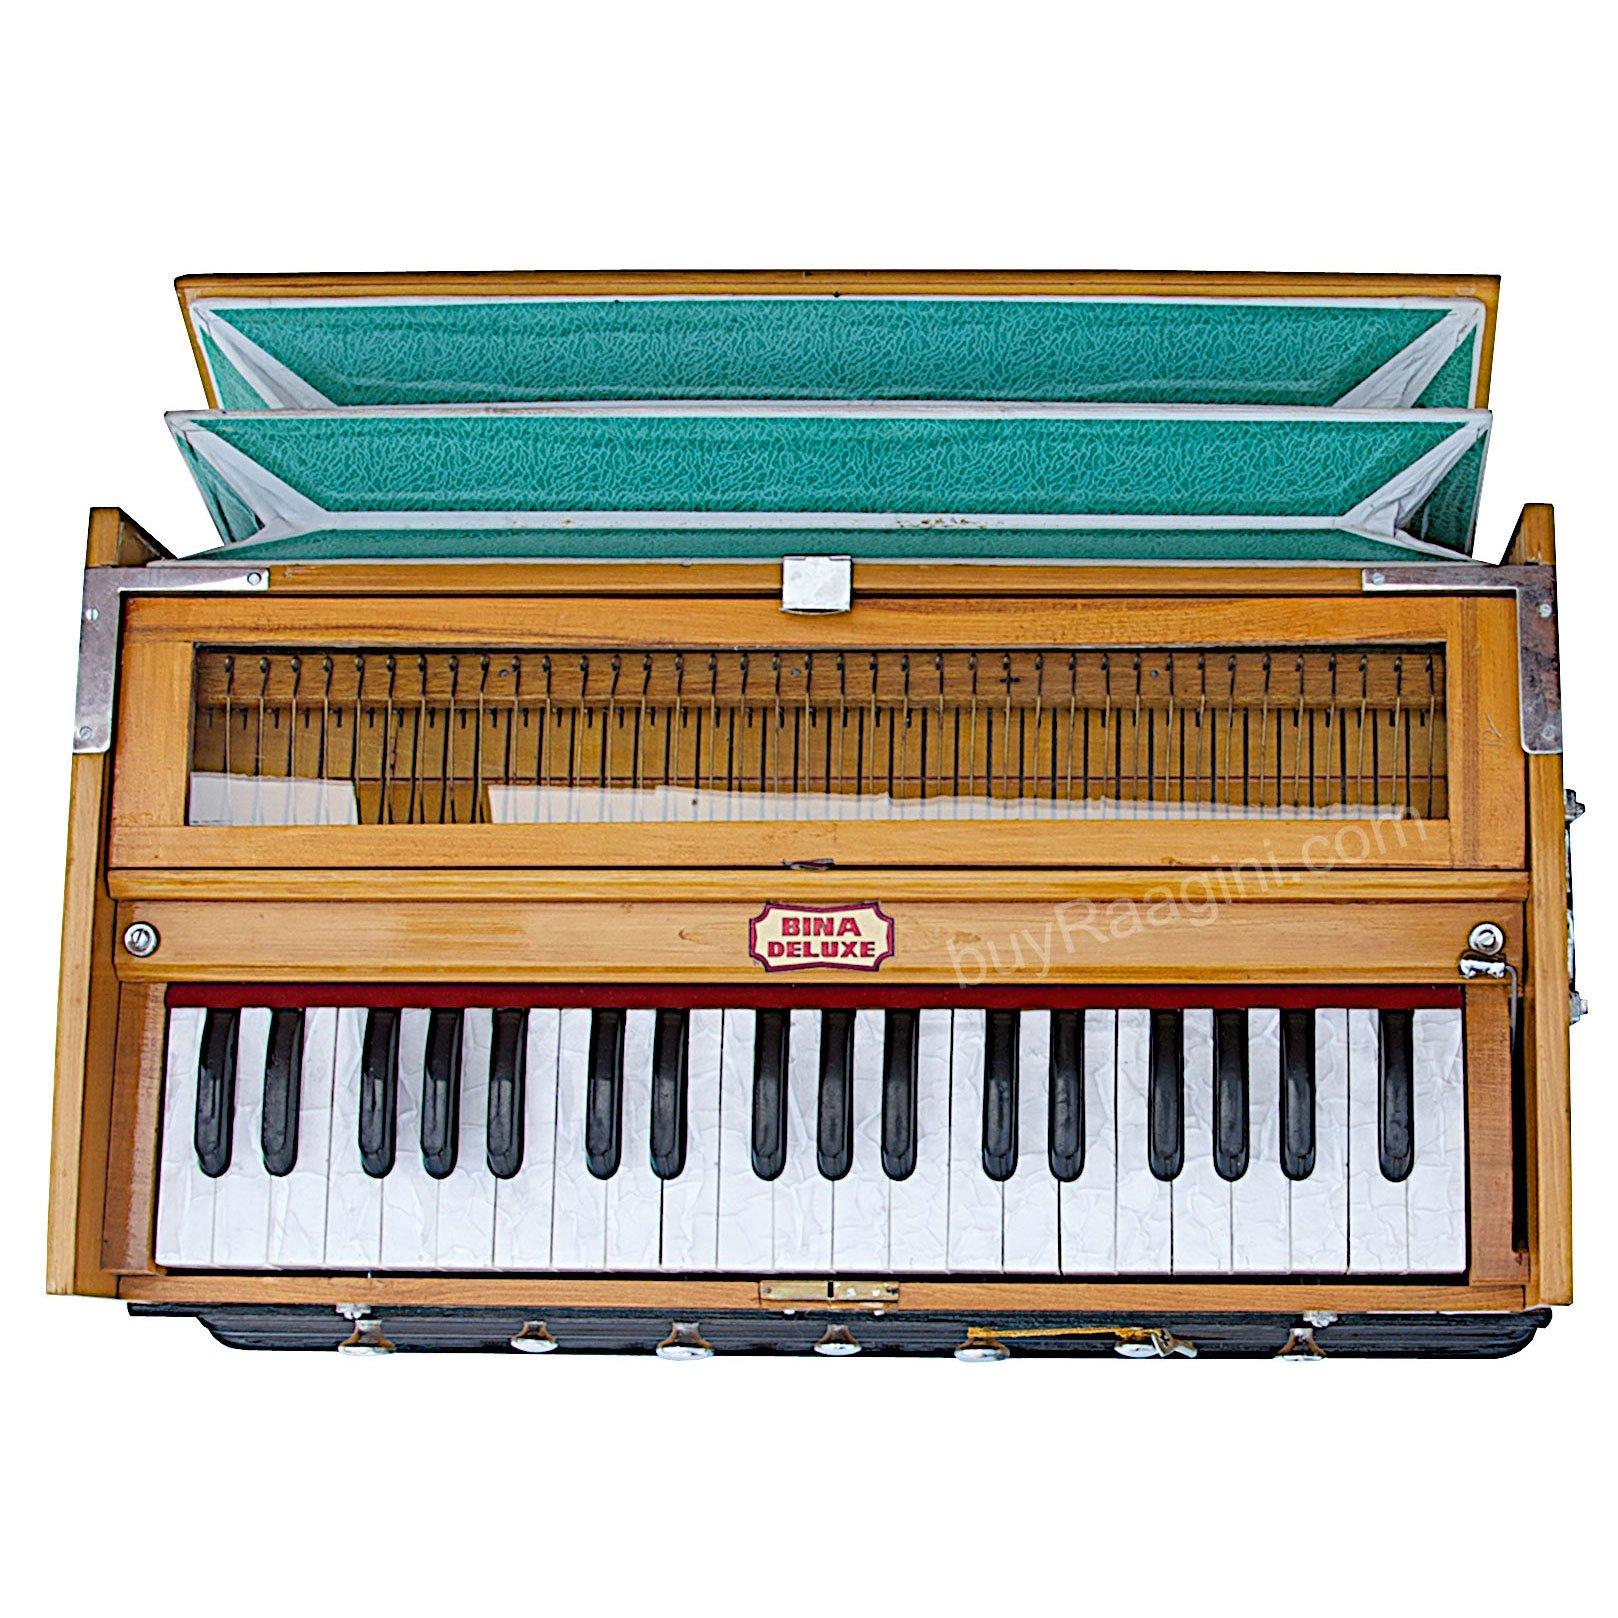 Harmonium Musical Instrument, BINA No. 8, 7 Stops, 3 1/4 Octaves, Coupler, Tuned To A400, Double Reed, Natural Color, Book, Nylon Bag (PDI-DJF) by Bina (Image #4)